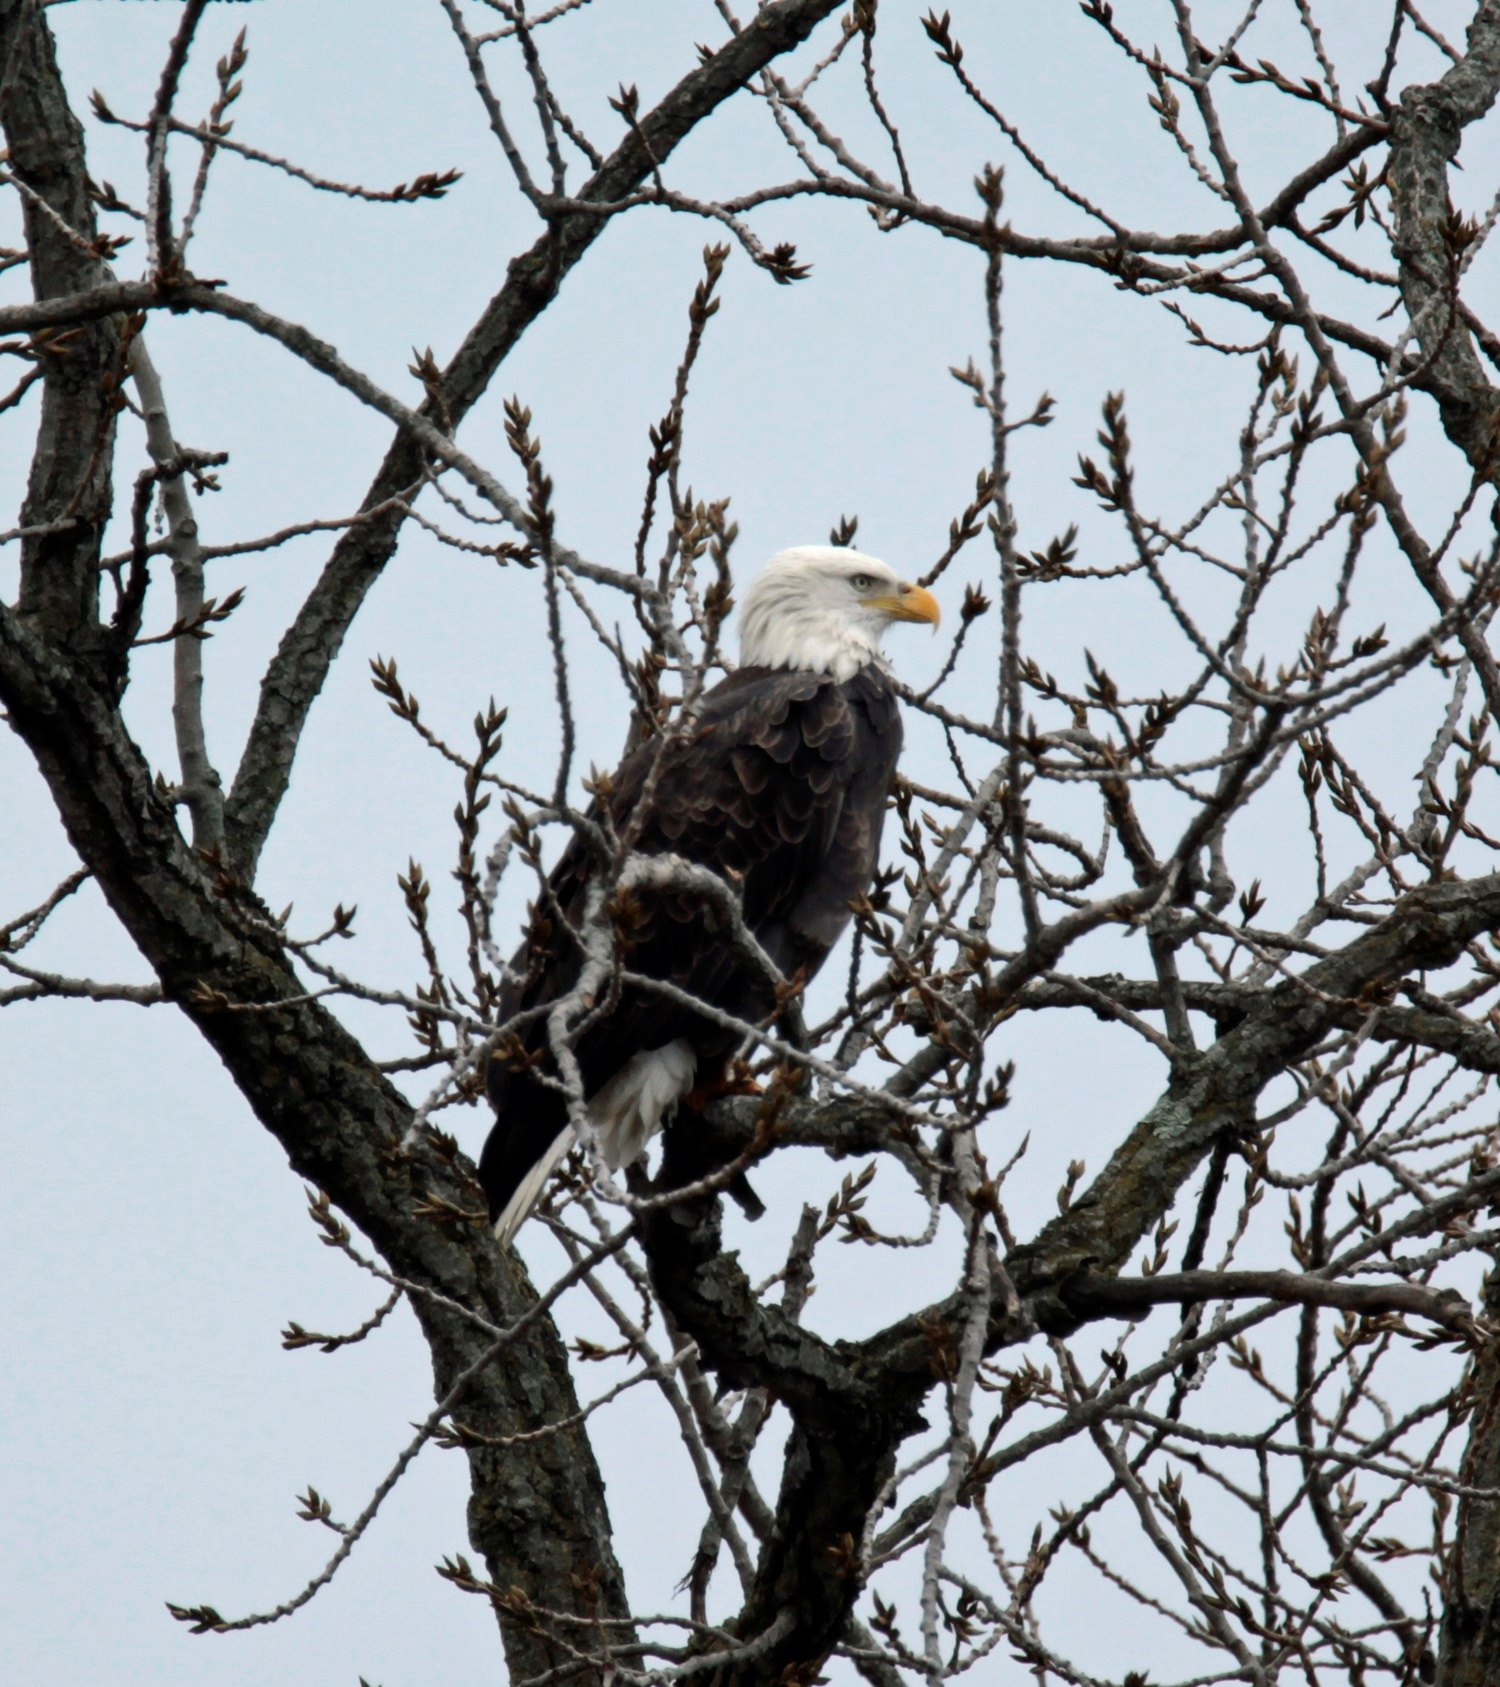 Ohio bald eagle perched in a tree